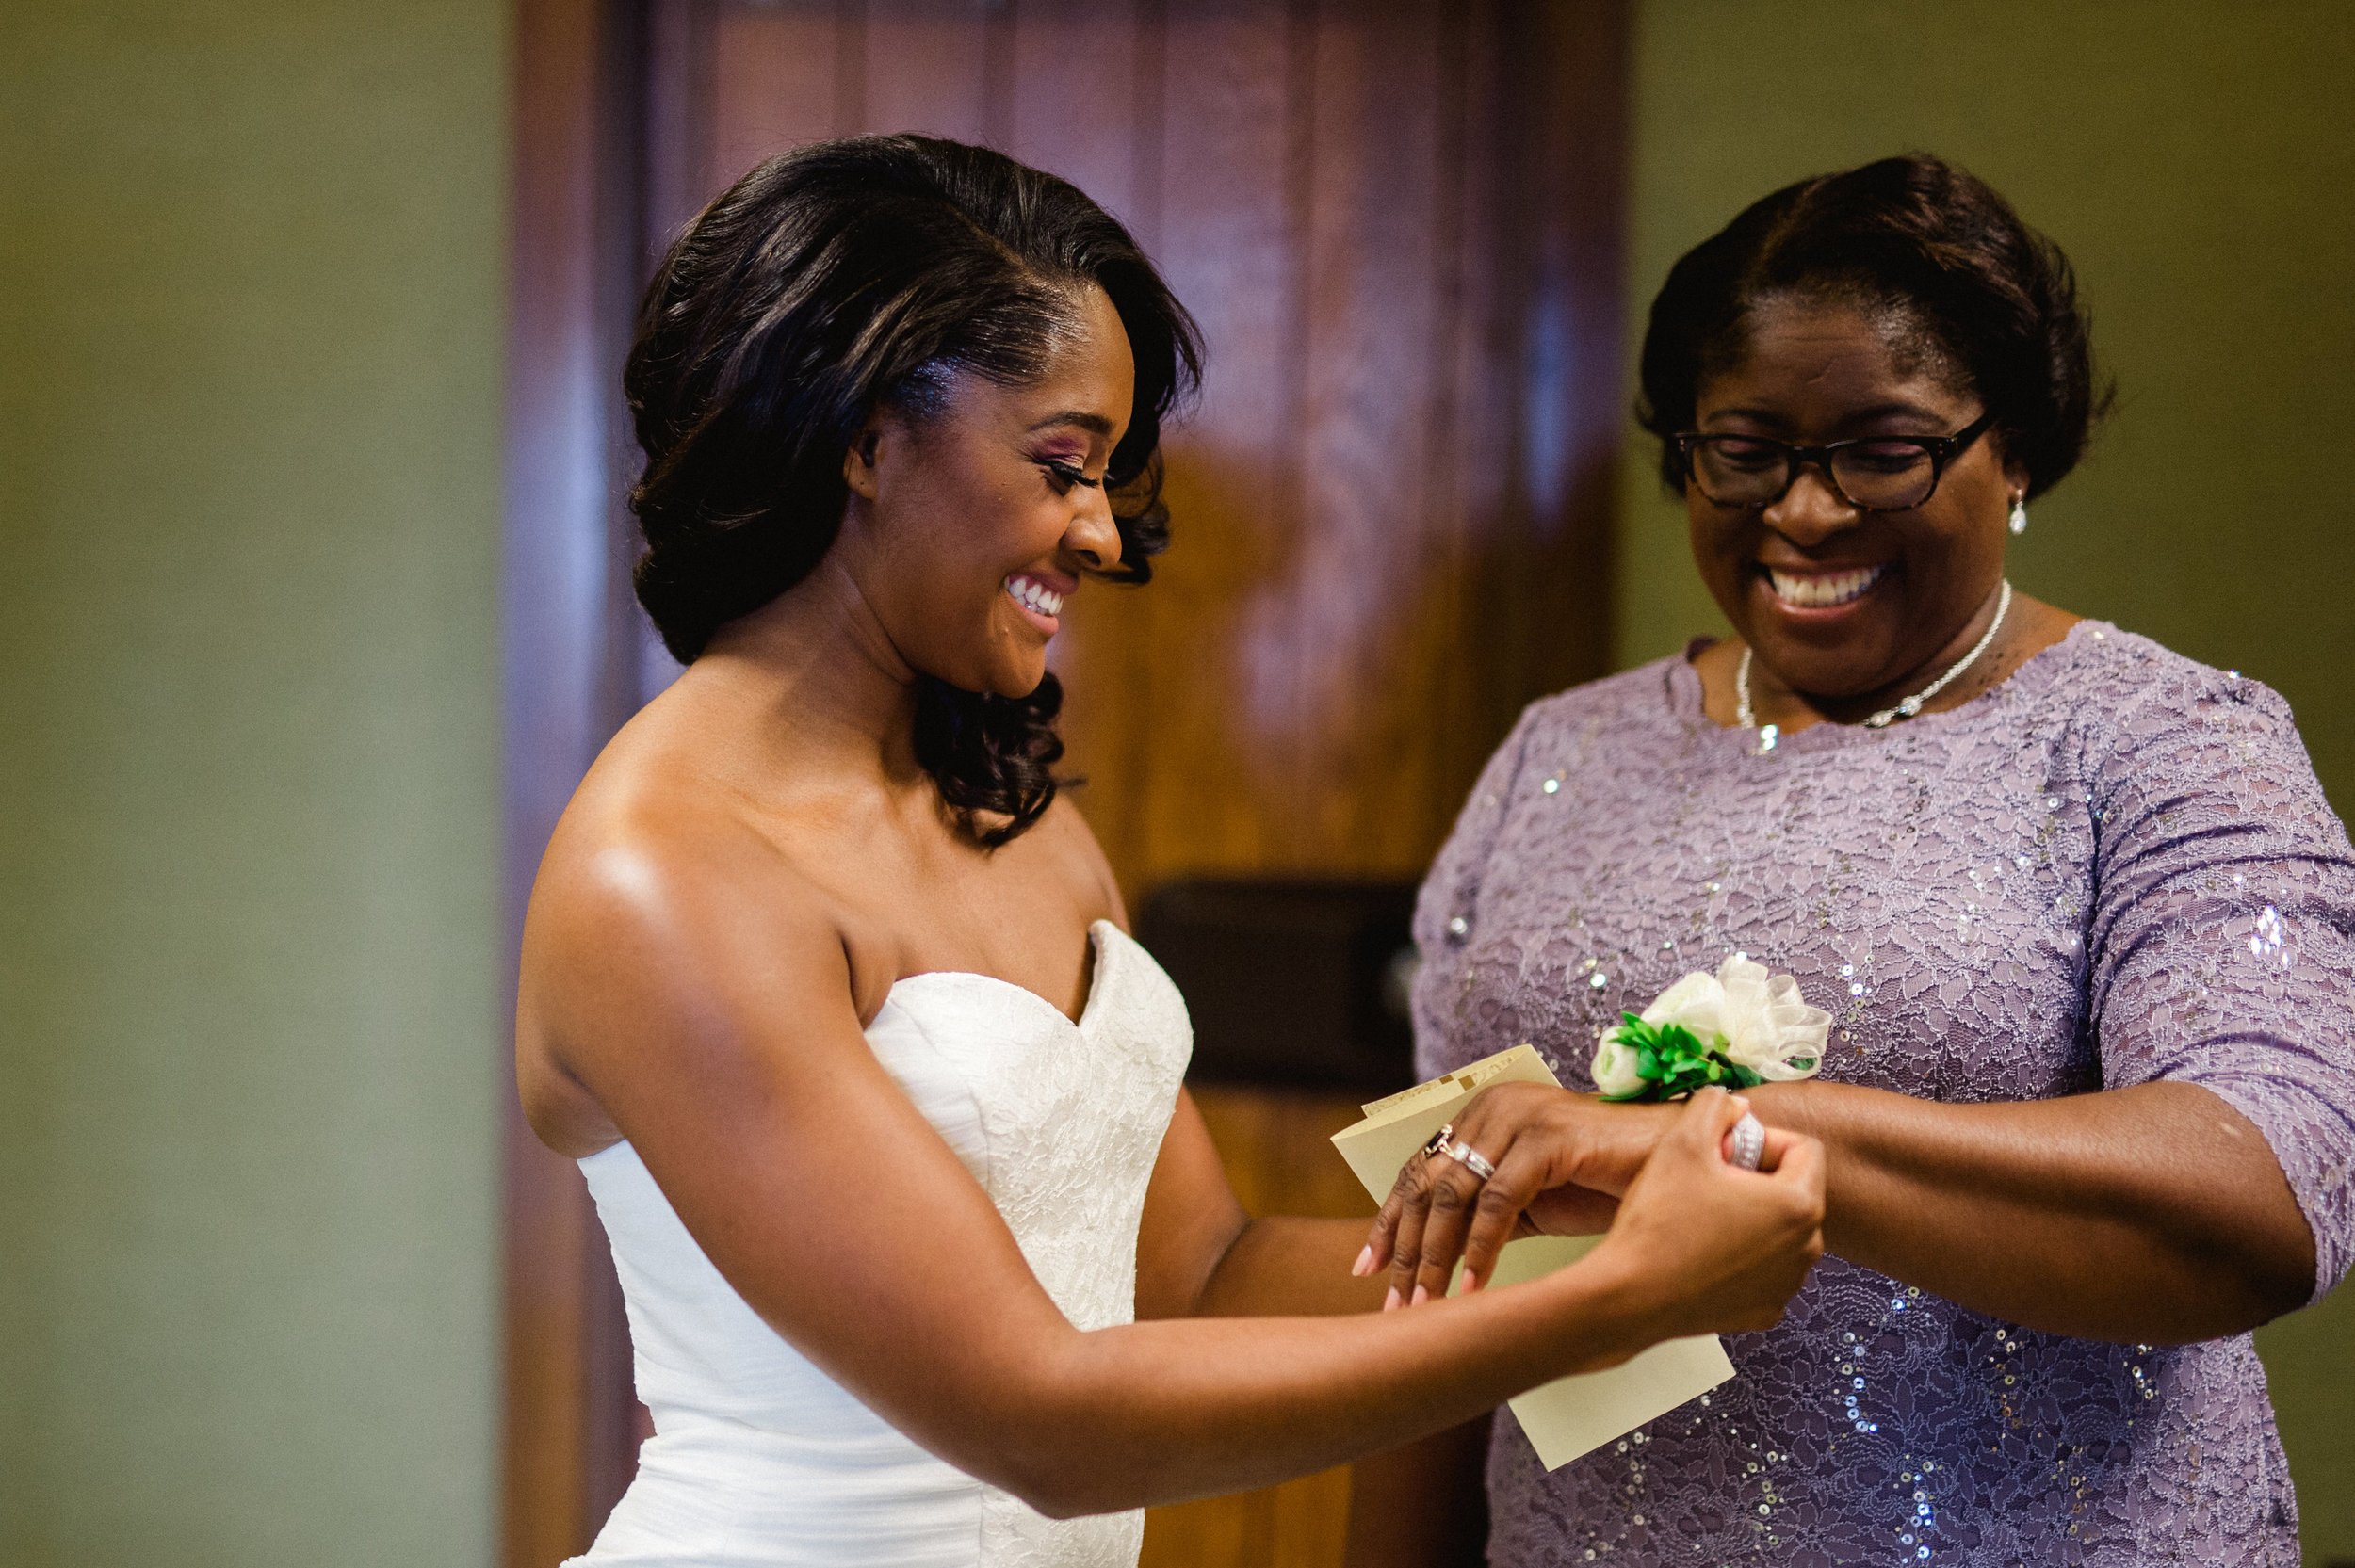 imani&chris|wedding|prewedding-207.jpg